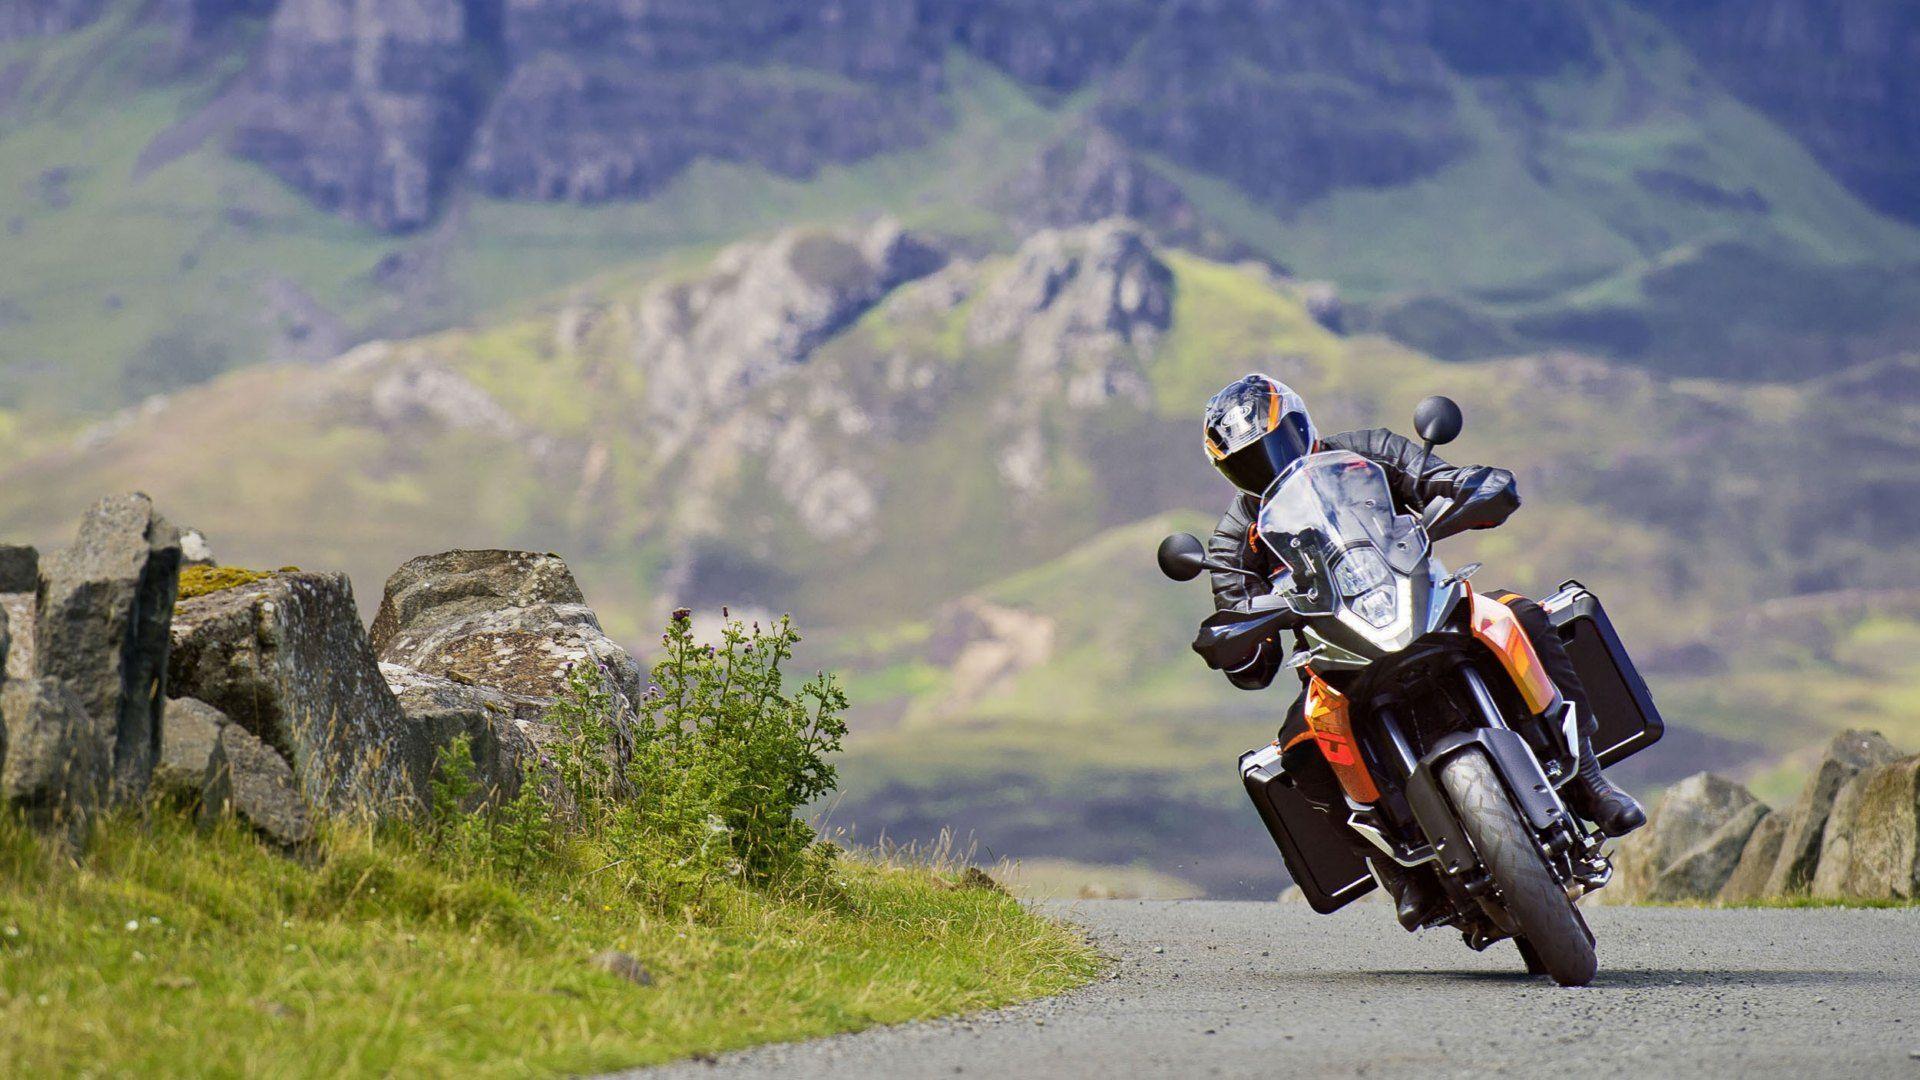 Ktm 1190 Adventure Single Ride Moto Hd Wallpaper Ktm Adventure Adventure Bike Adventure Motorcycling Get wallpaper ktm super adventure